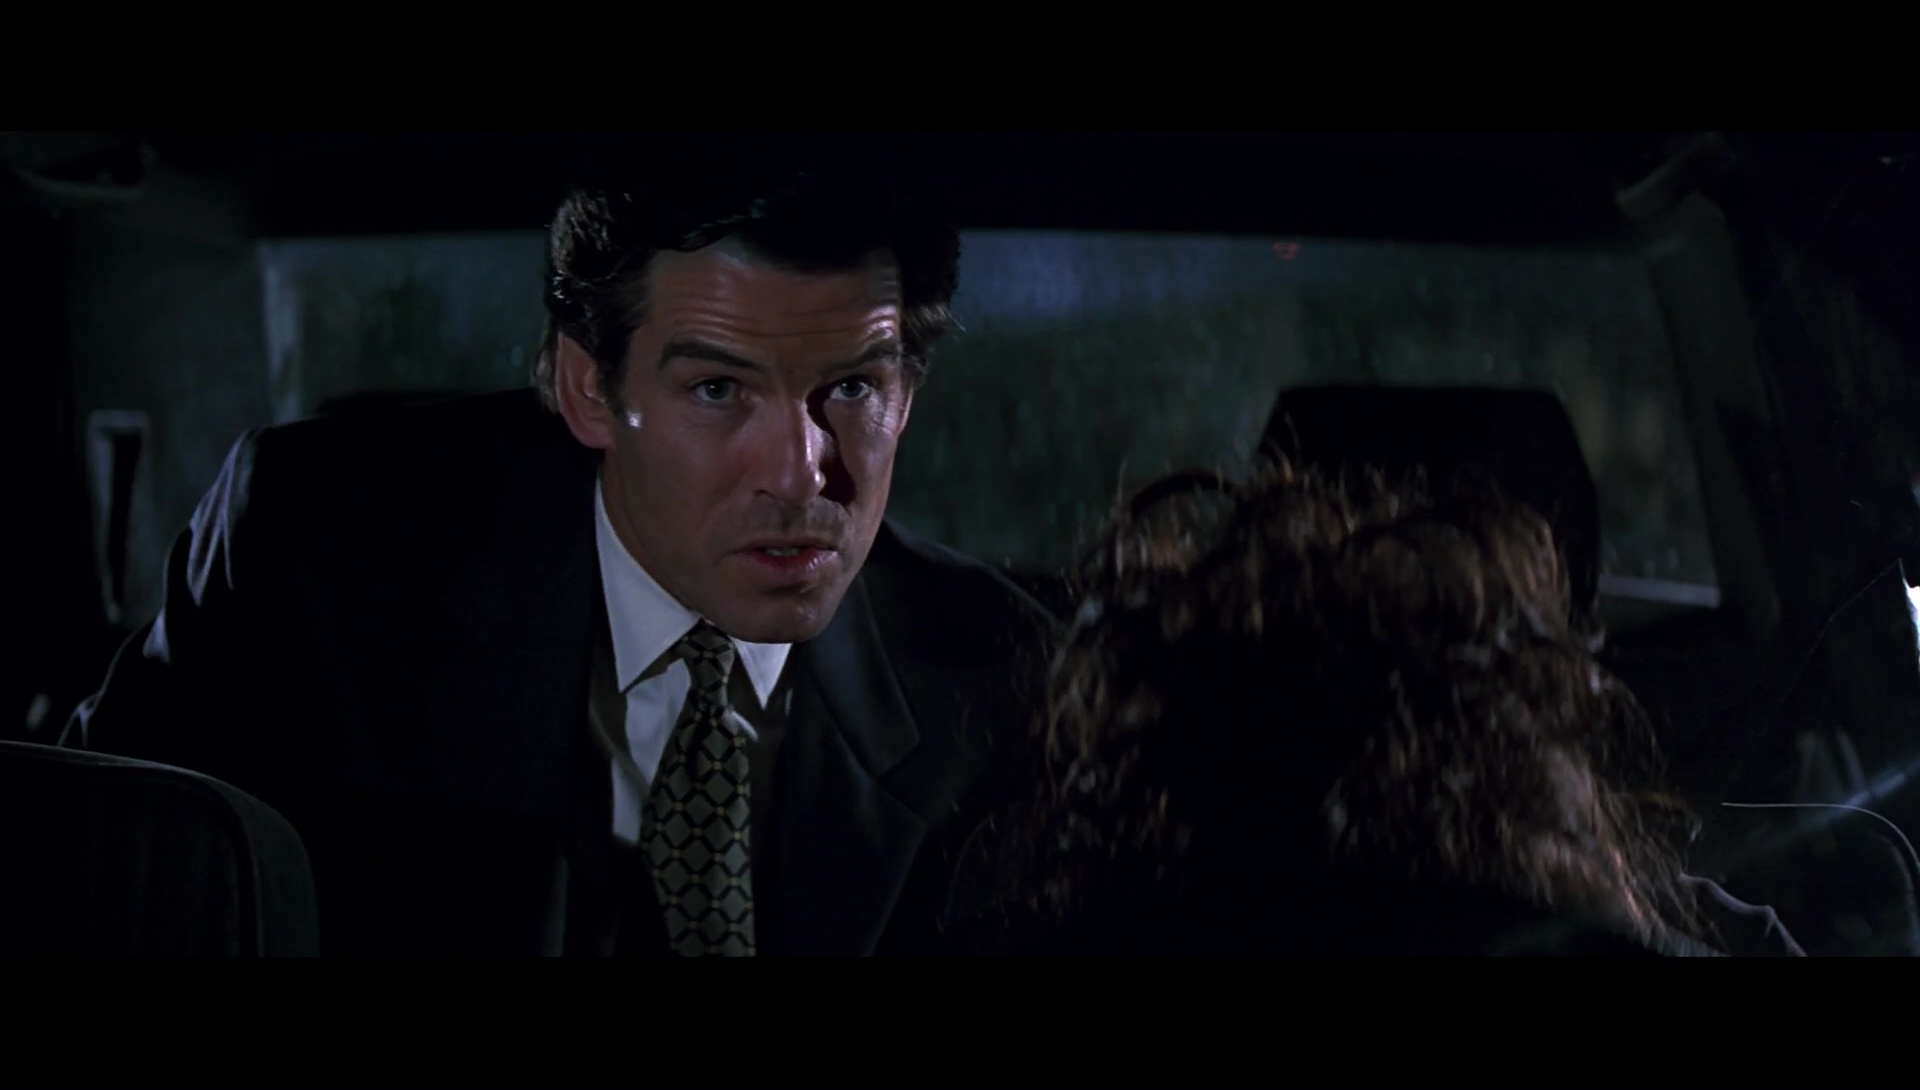 007 GoldenEye 1080p Lat-Cast-Ing 5.1 (1995)